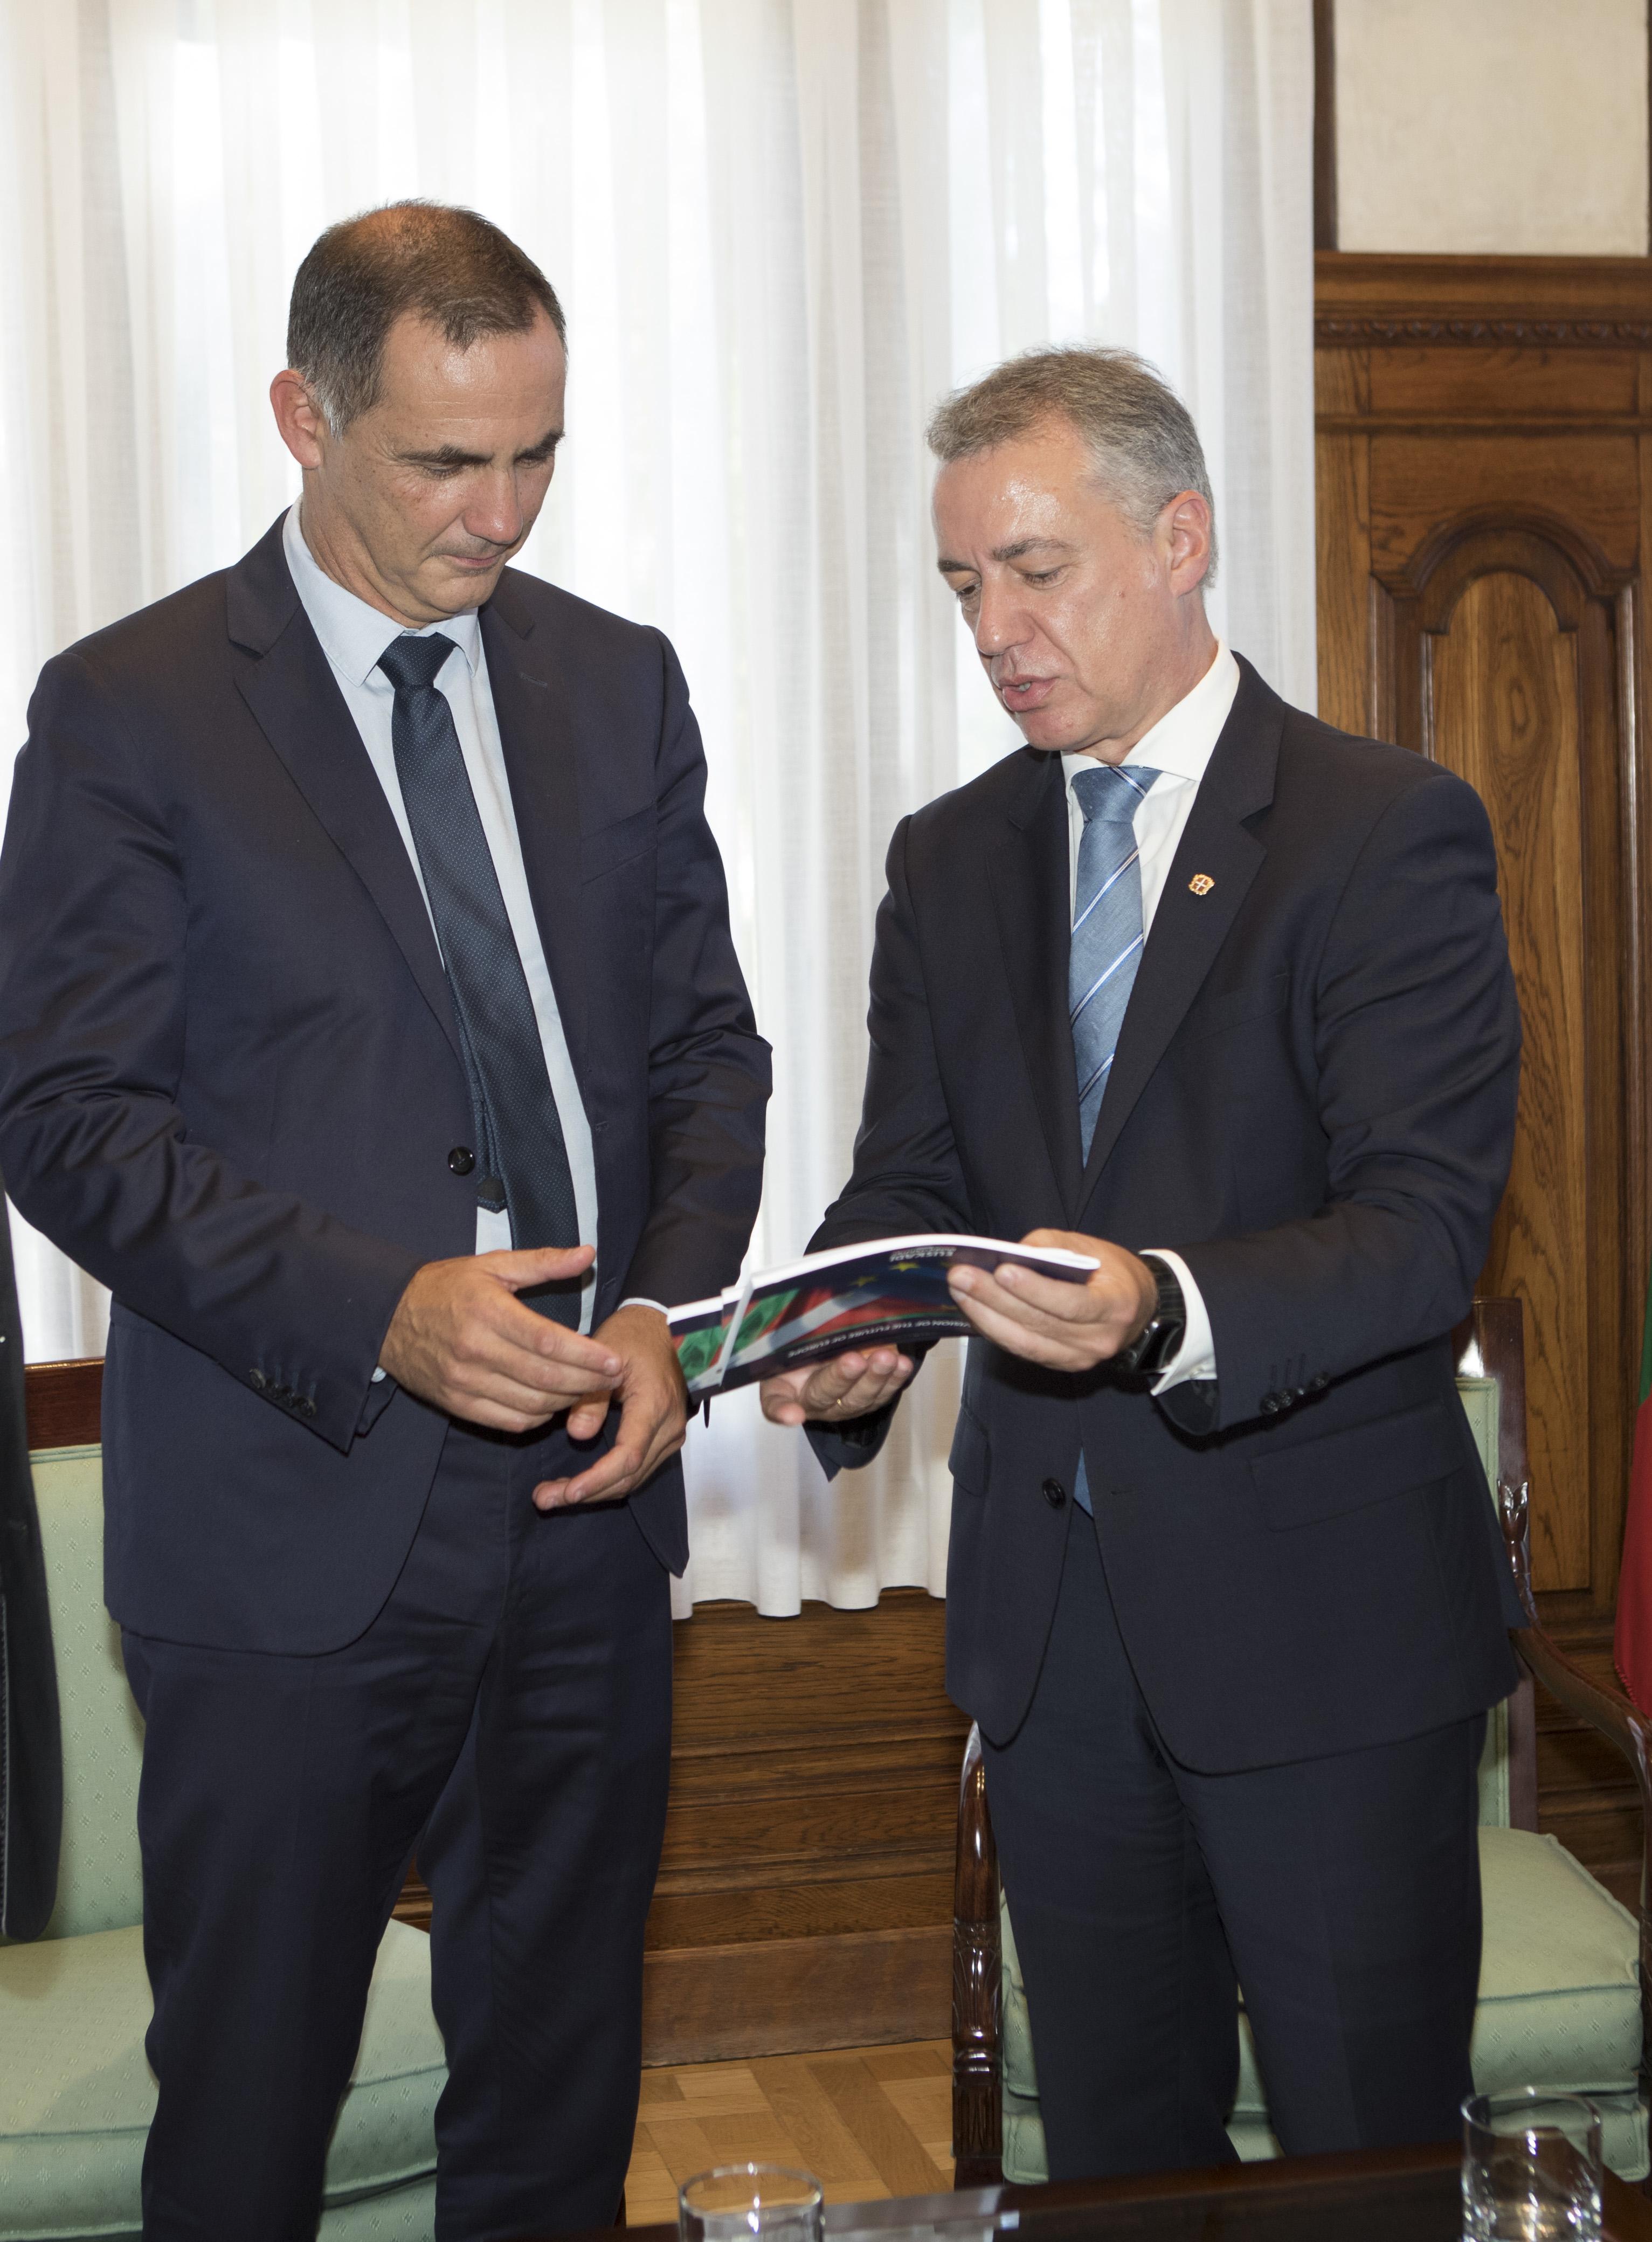 2019_09_28_lhk_presidente_Corcega_04.jpg